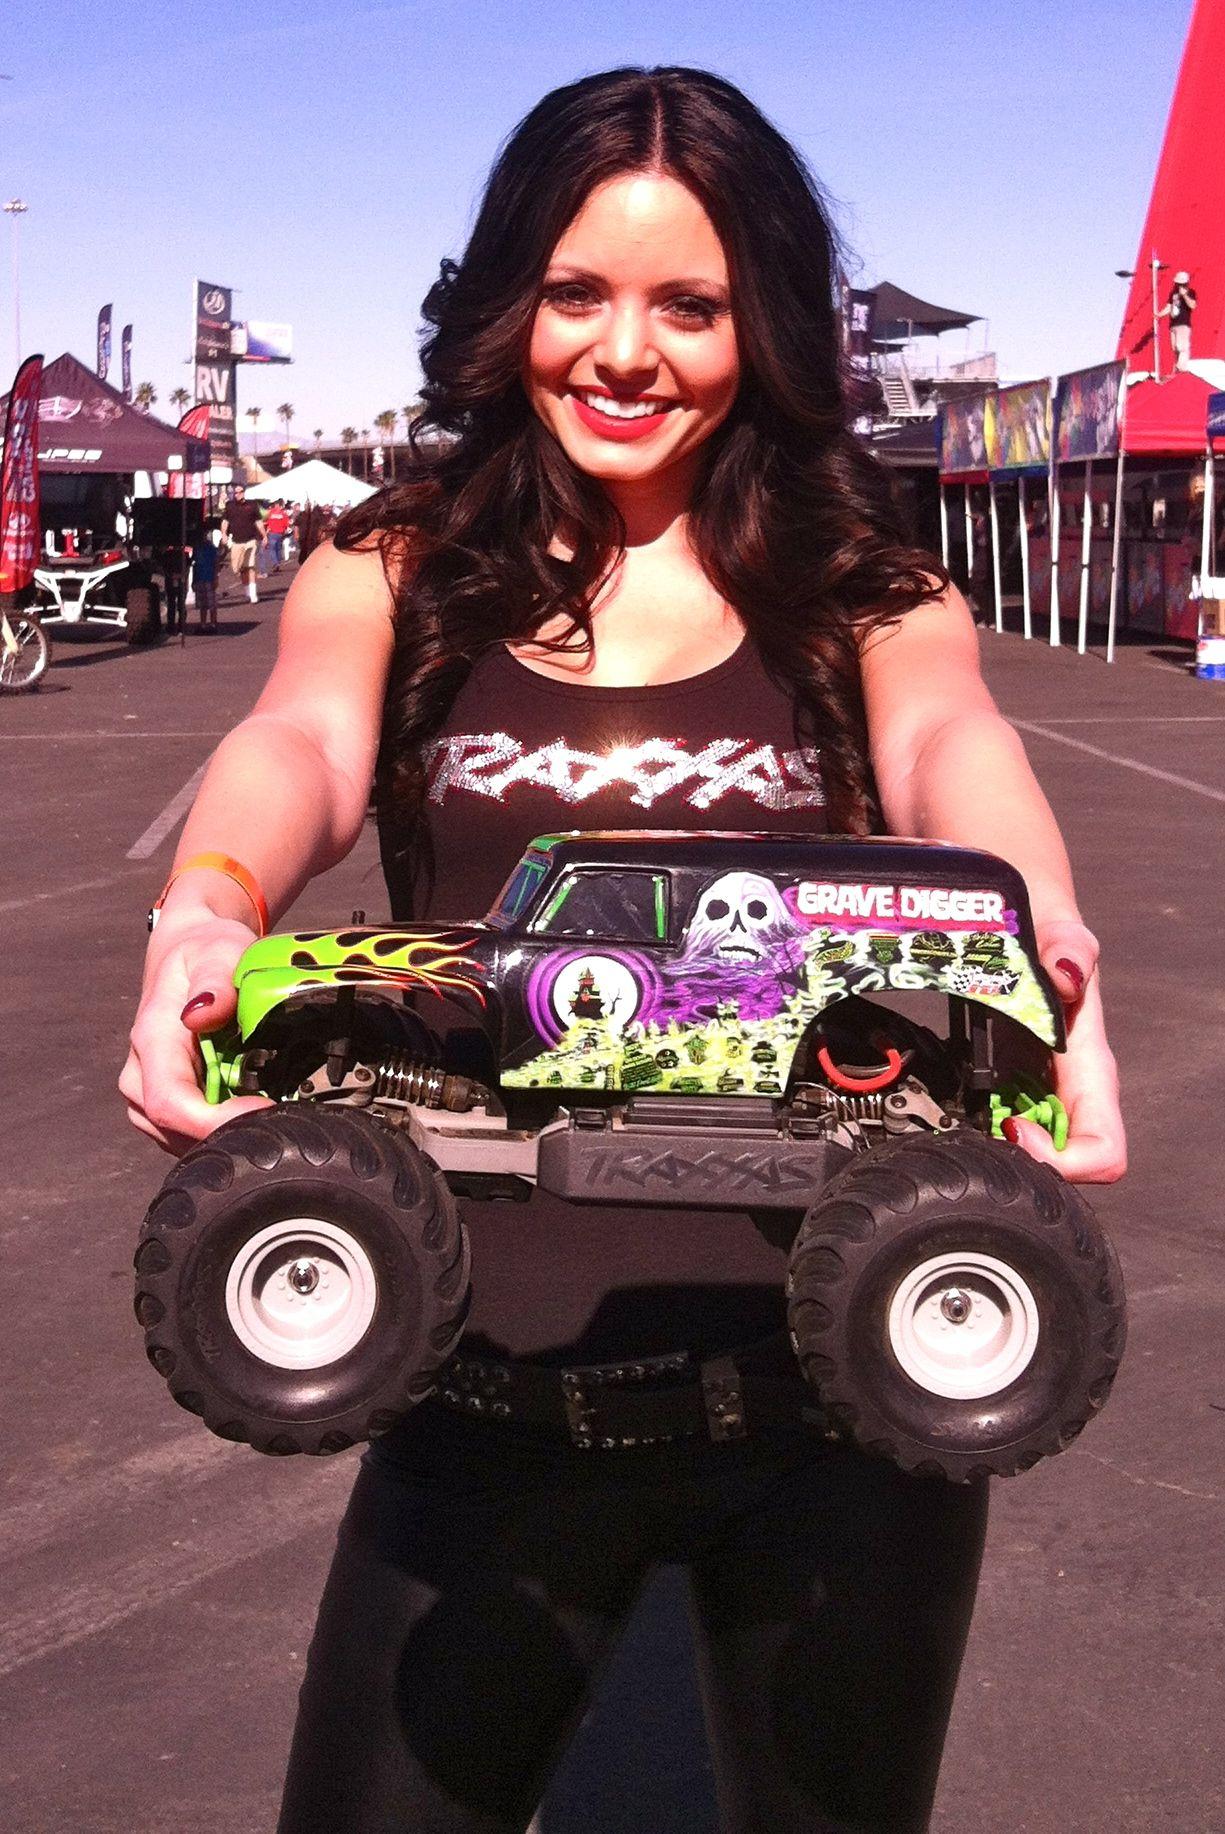 Traxxas Girl Emmy Rc Cars Traxxas Traxxas Rc Cars And Trucks